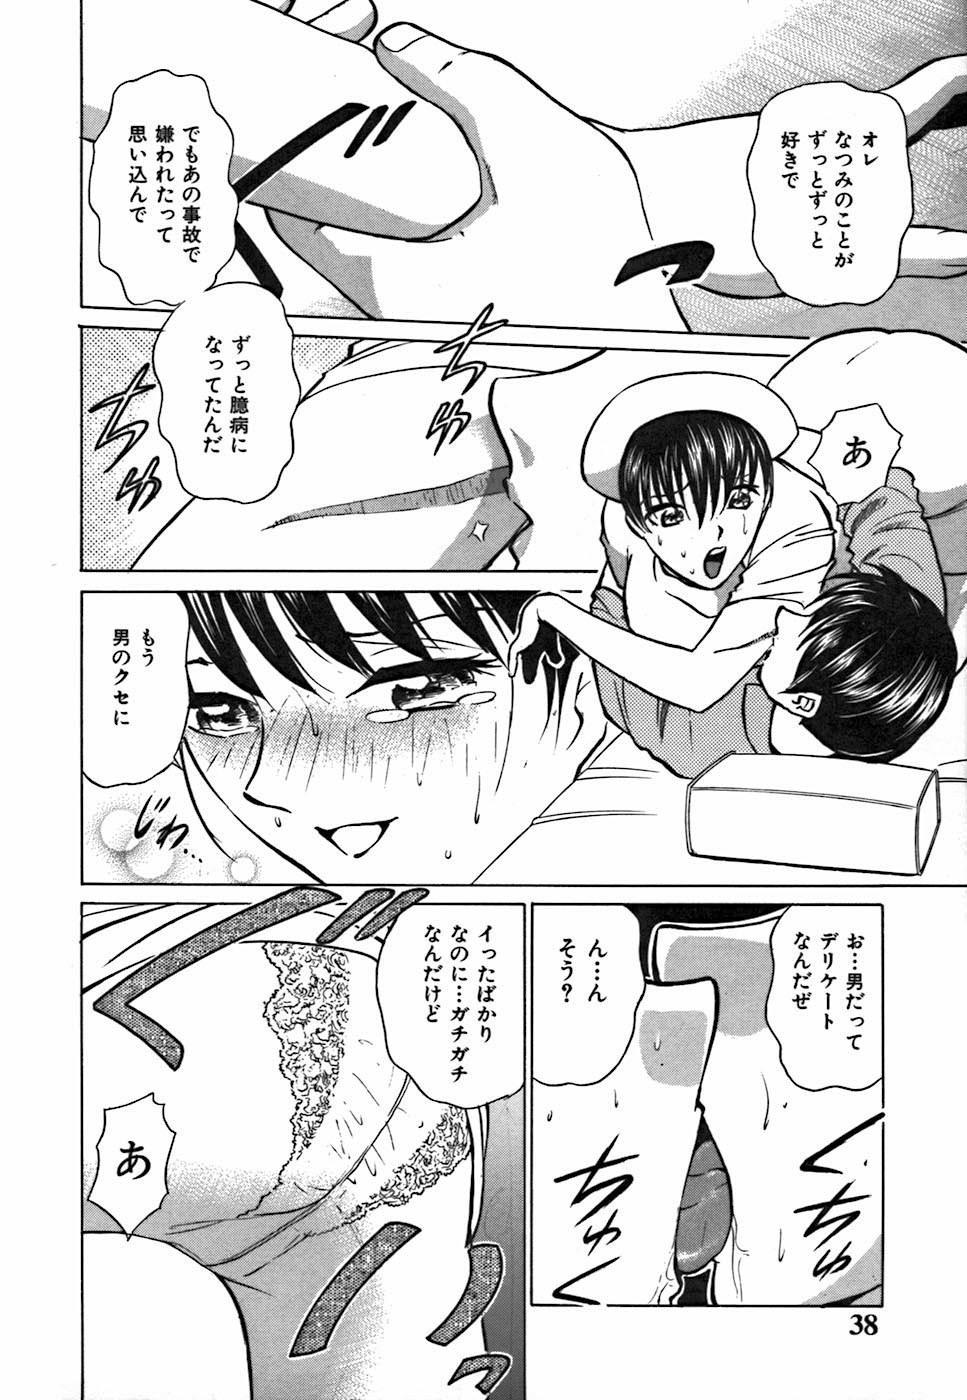 Kimi ga Nozomu Katachi | Appearance for which you hope 37